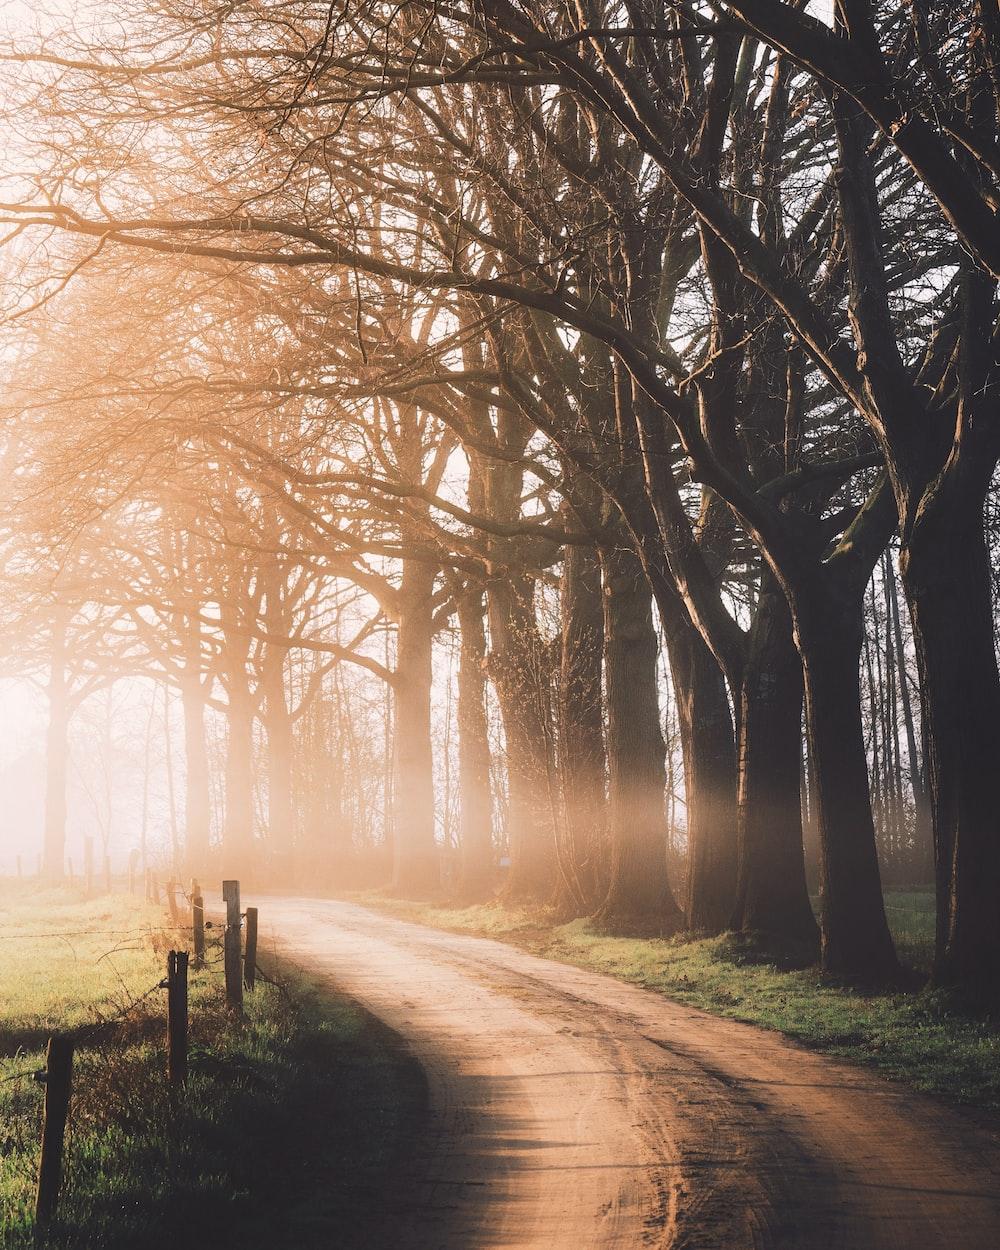 dirt-road beside trees